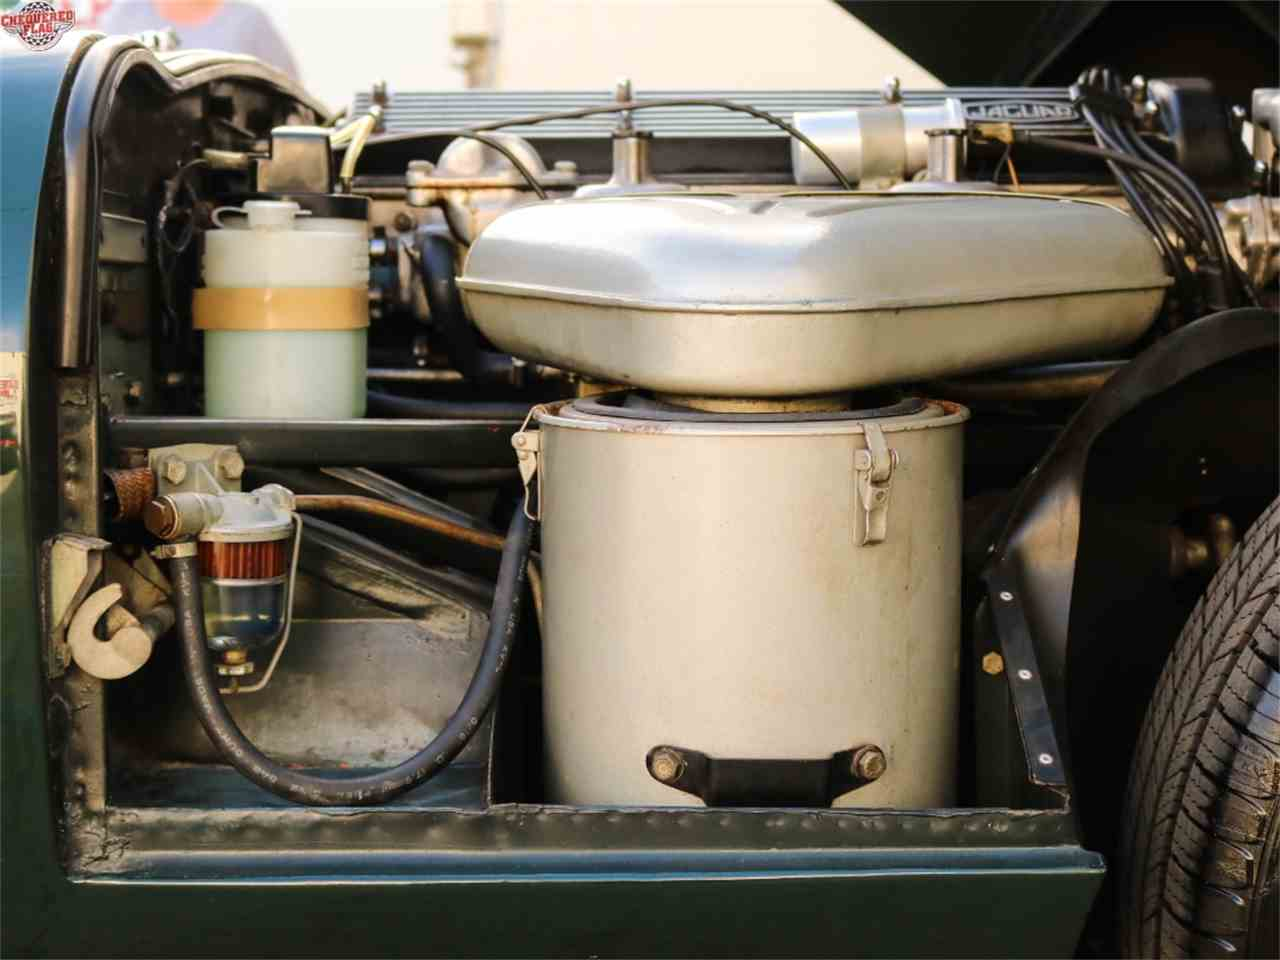 Large Picture of 1969 Jaguar E-Type located in Marina Del Rey California - $67,500.00 - M6RZ